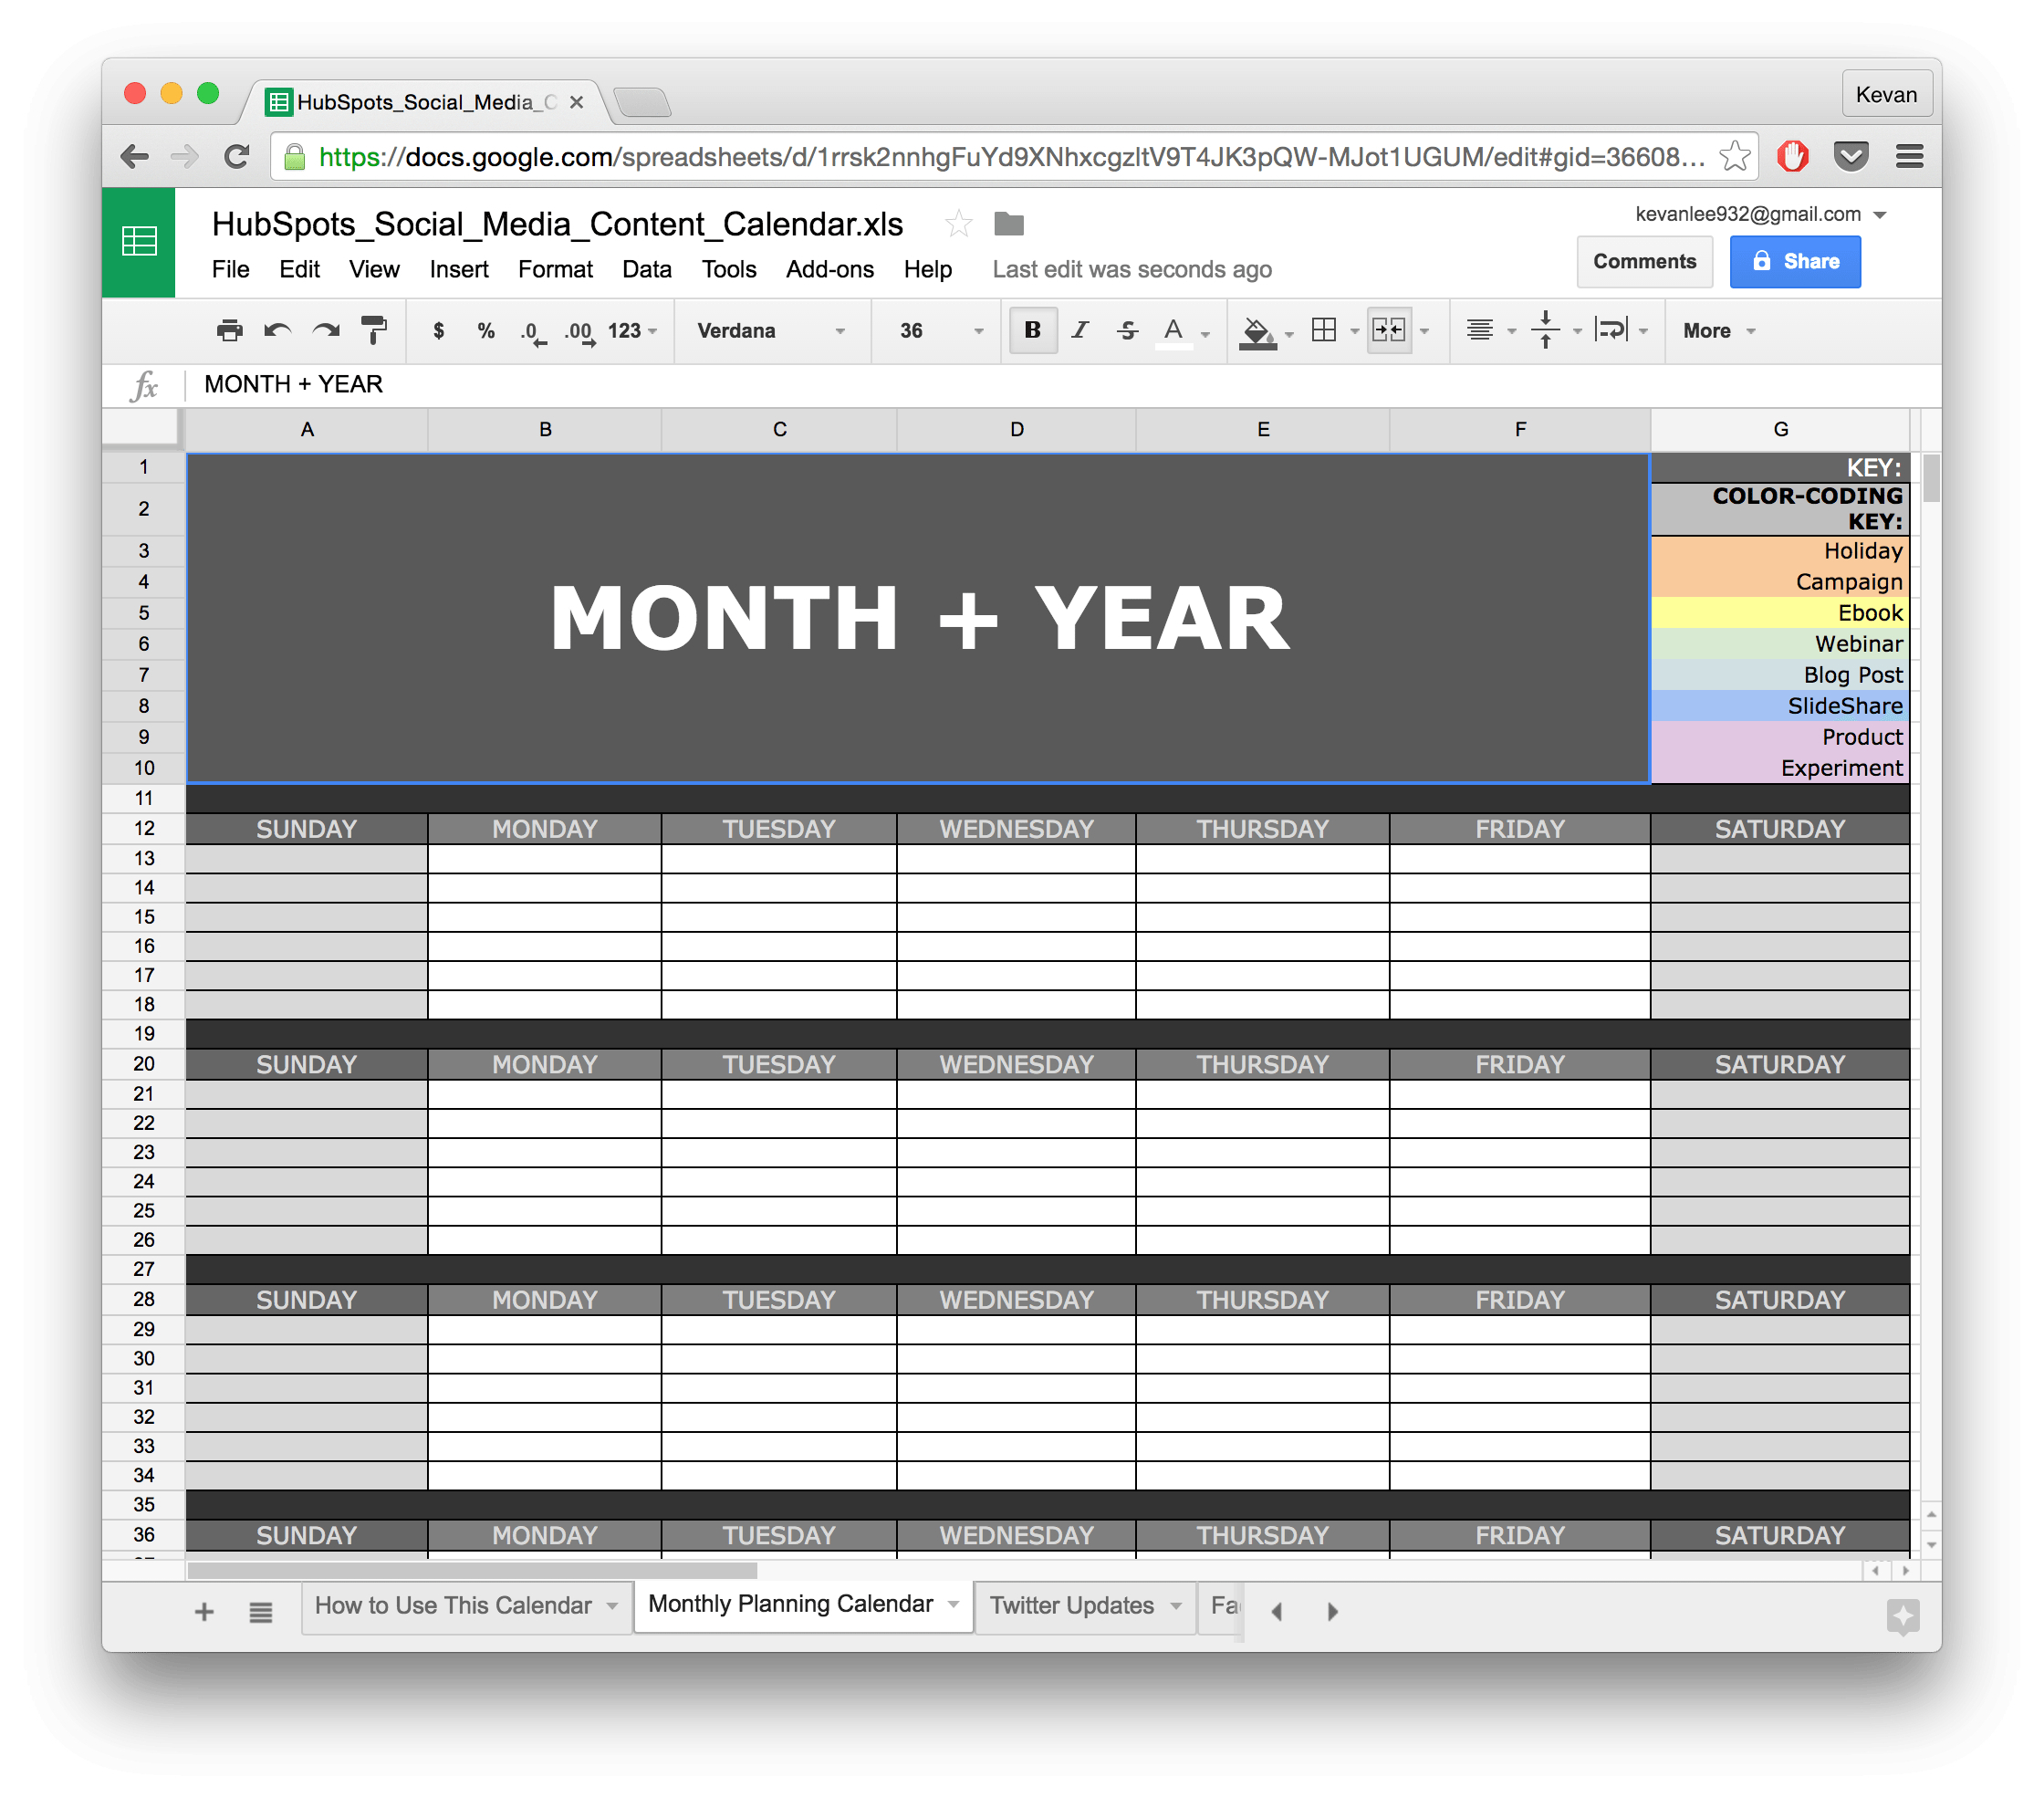 Social Media Calendar Template Google Docs  Planner with regard to Google Docs Editorial Calendar Template